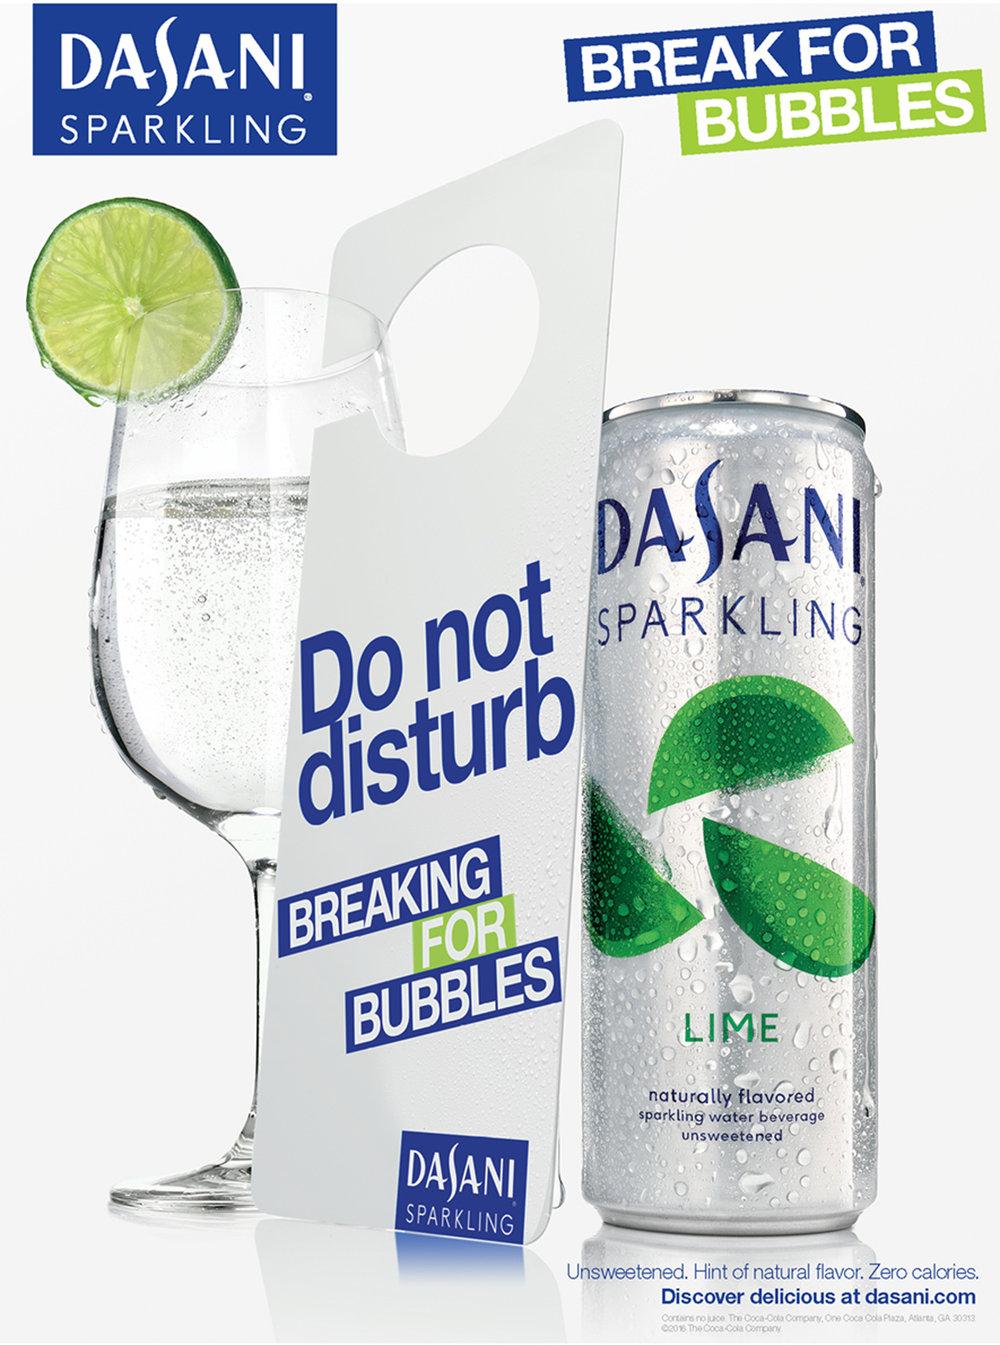 051816 Sparkling Do Not Disturb 16-170-012.jpg